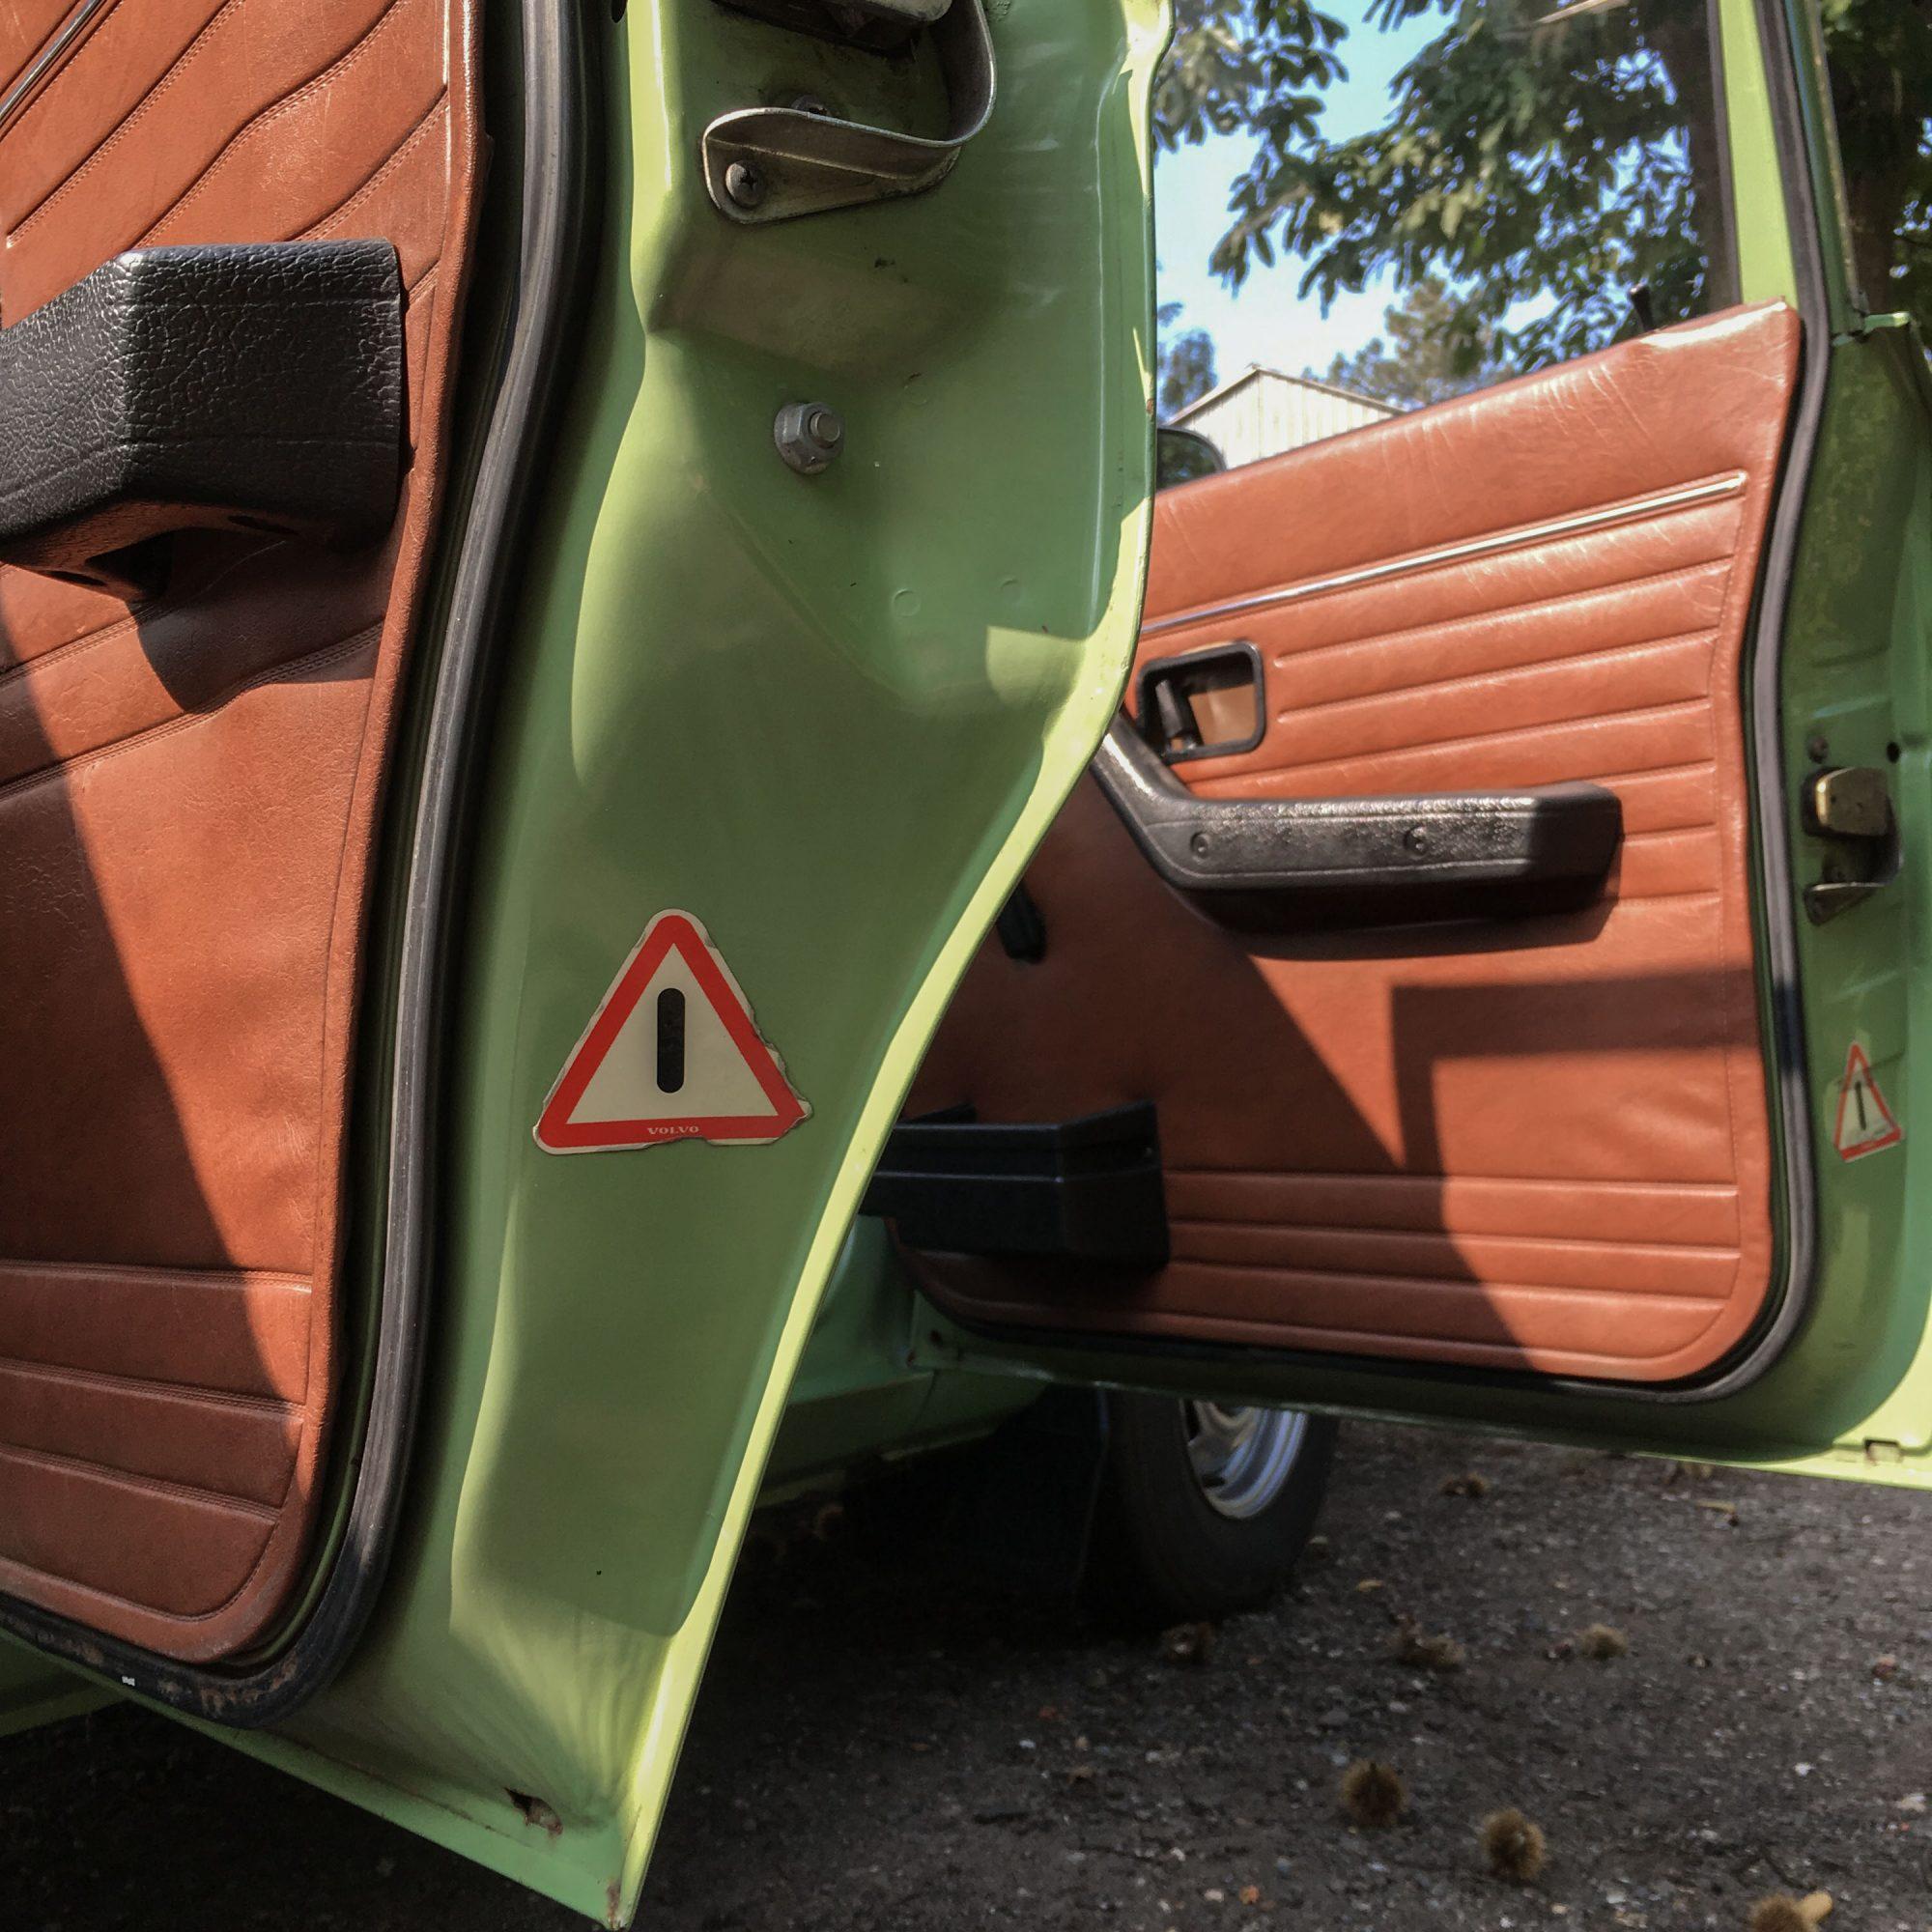 Yannick-Moonen-1976-Volvo-245L-Road-Trip-16-2000x2000